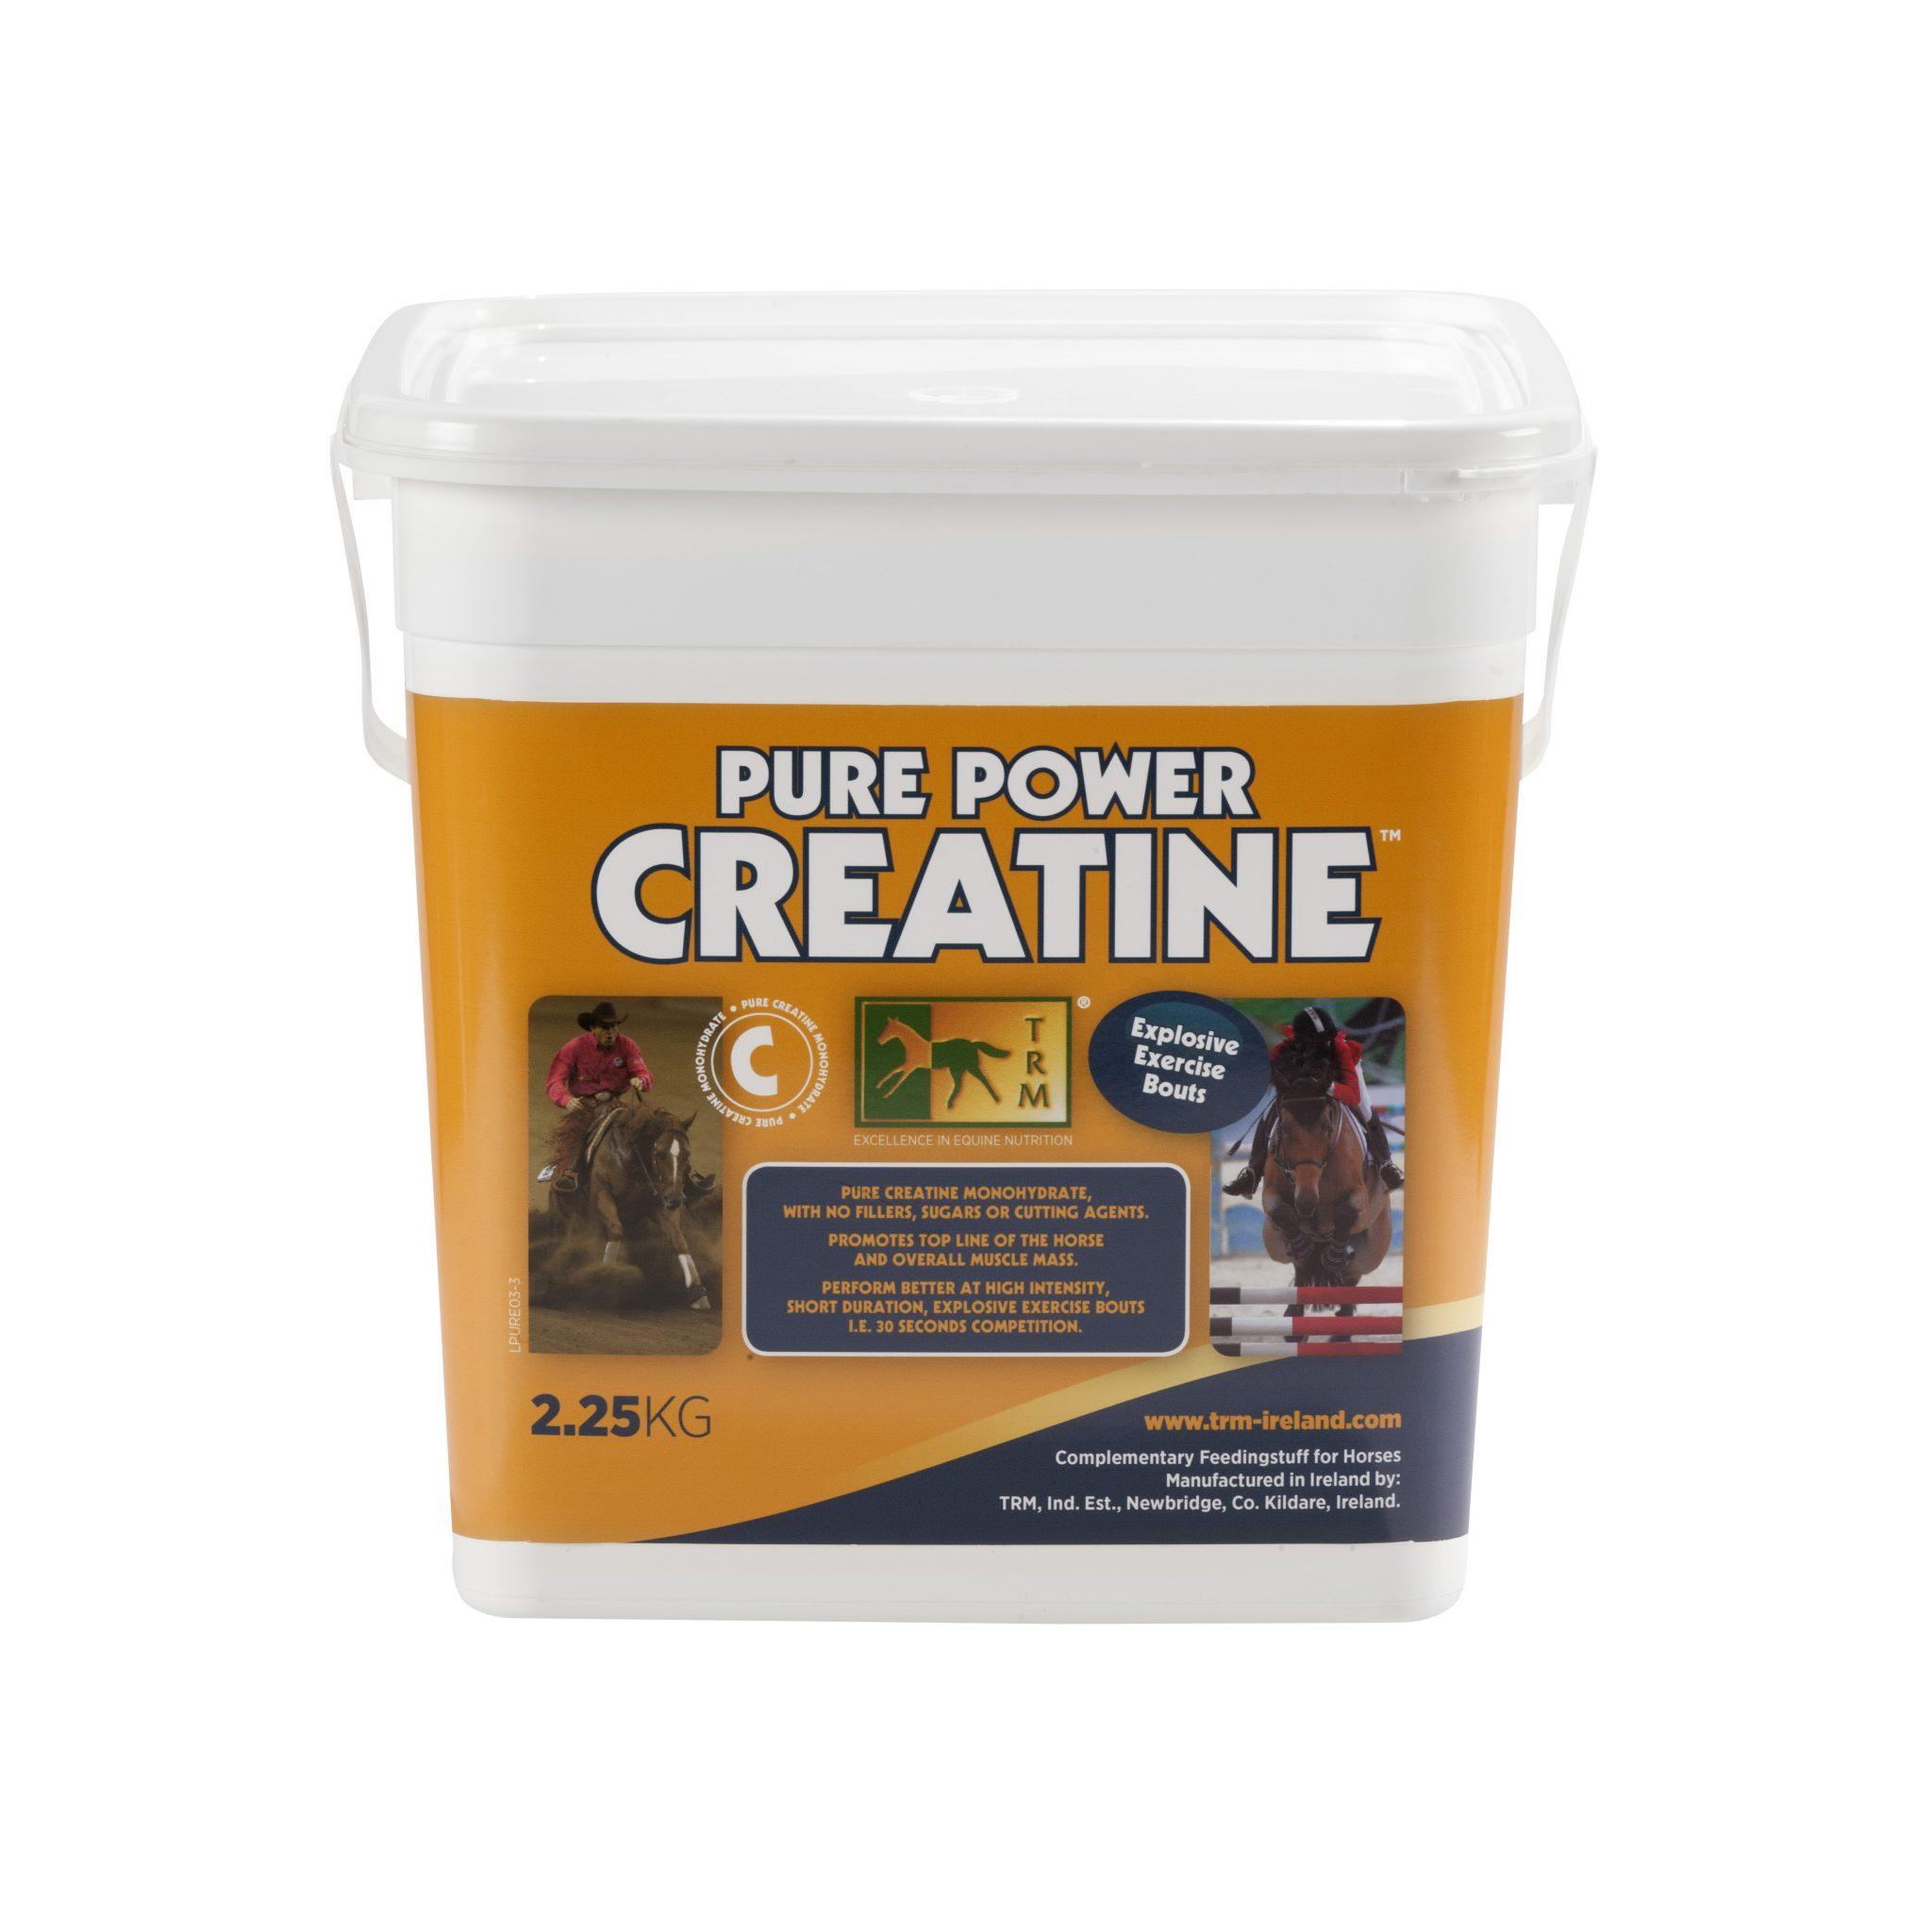 TRM Pure Power Creatine 2250g Jan 15 1